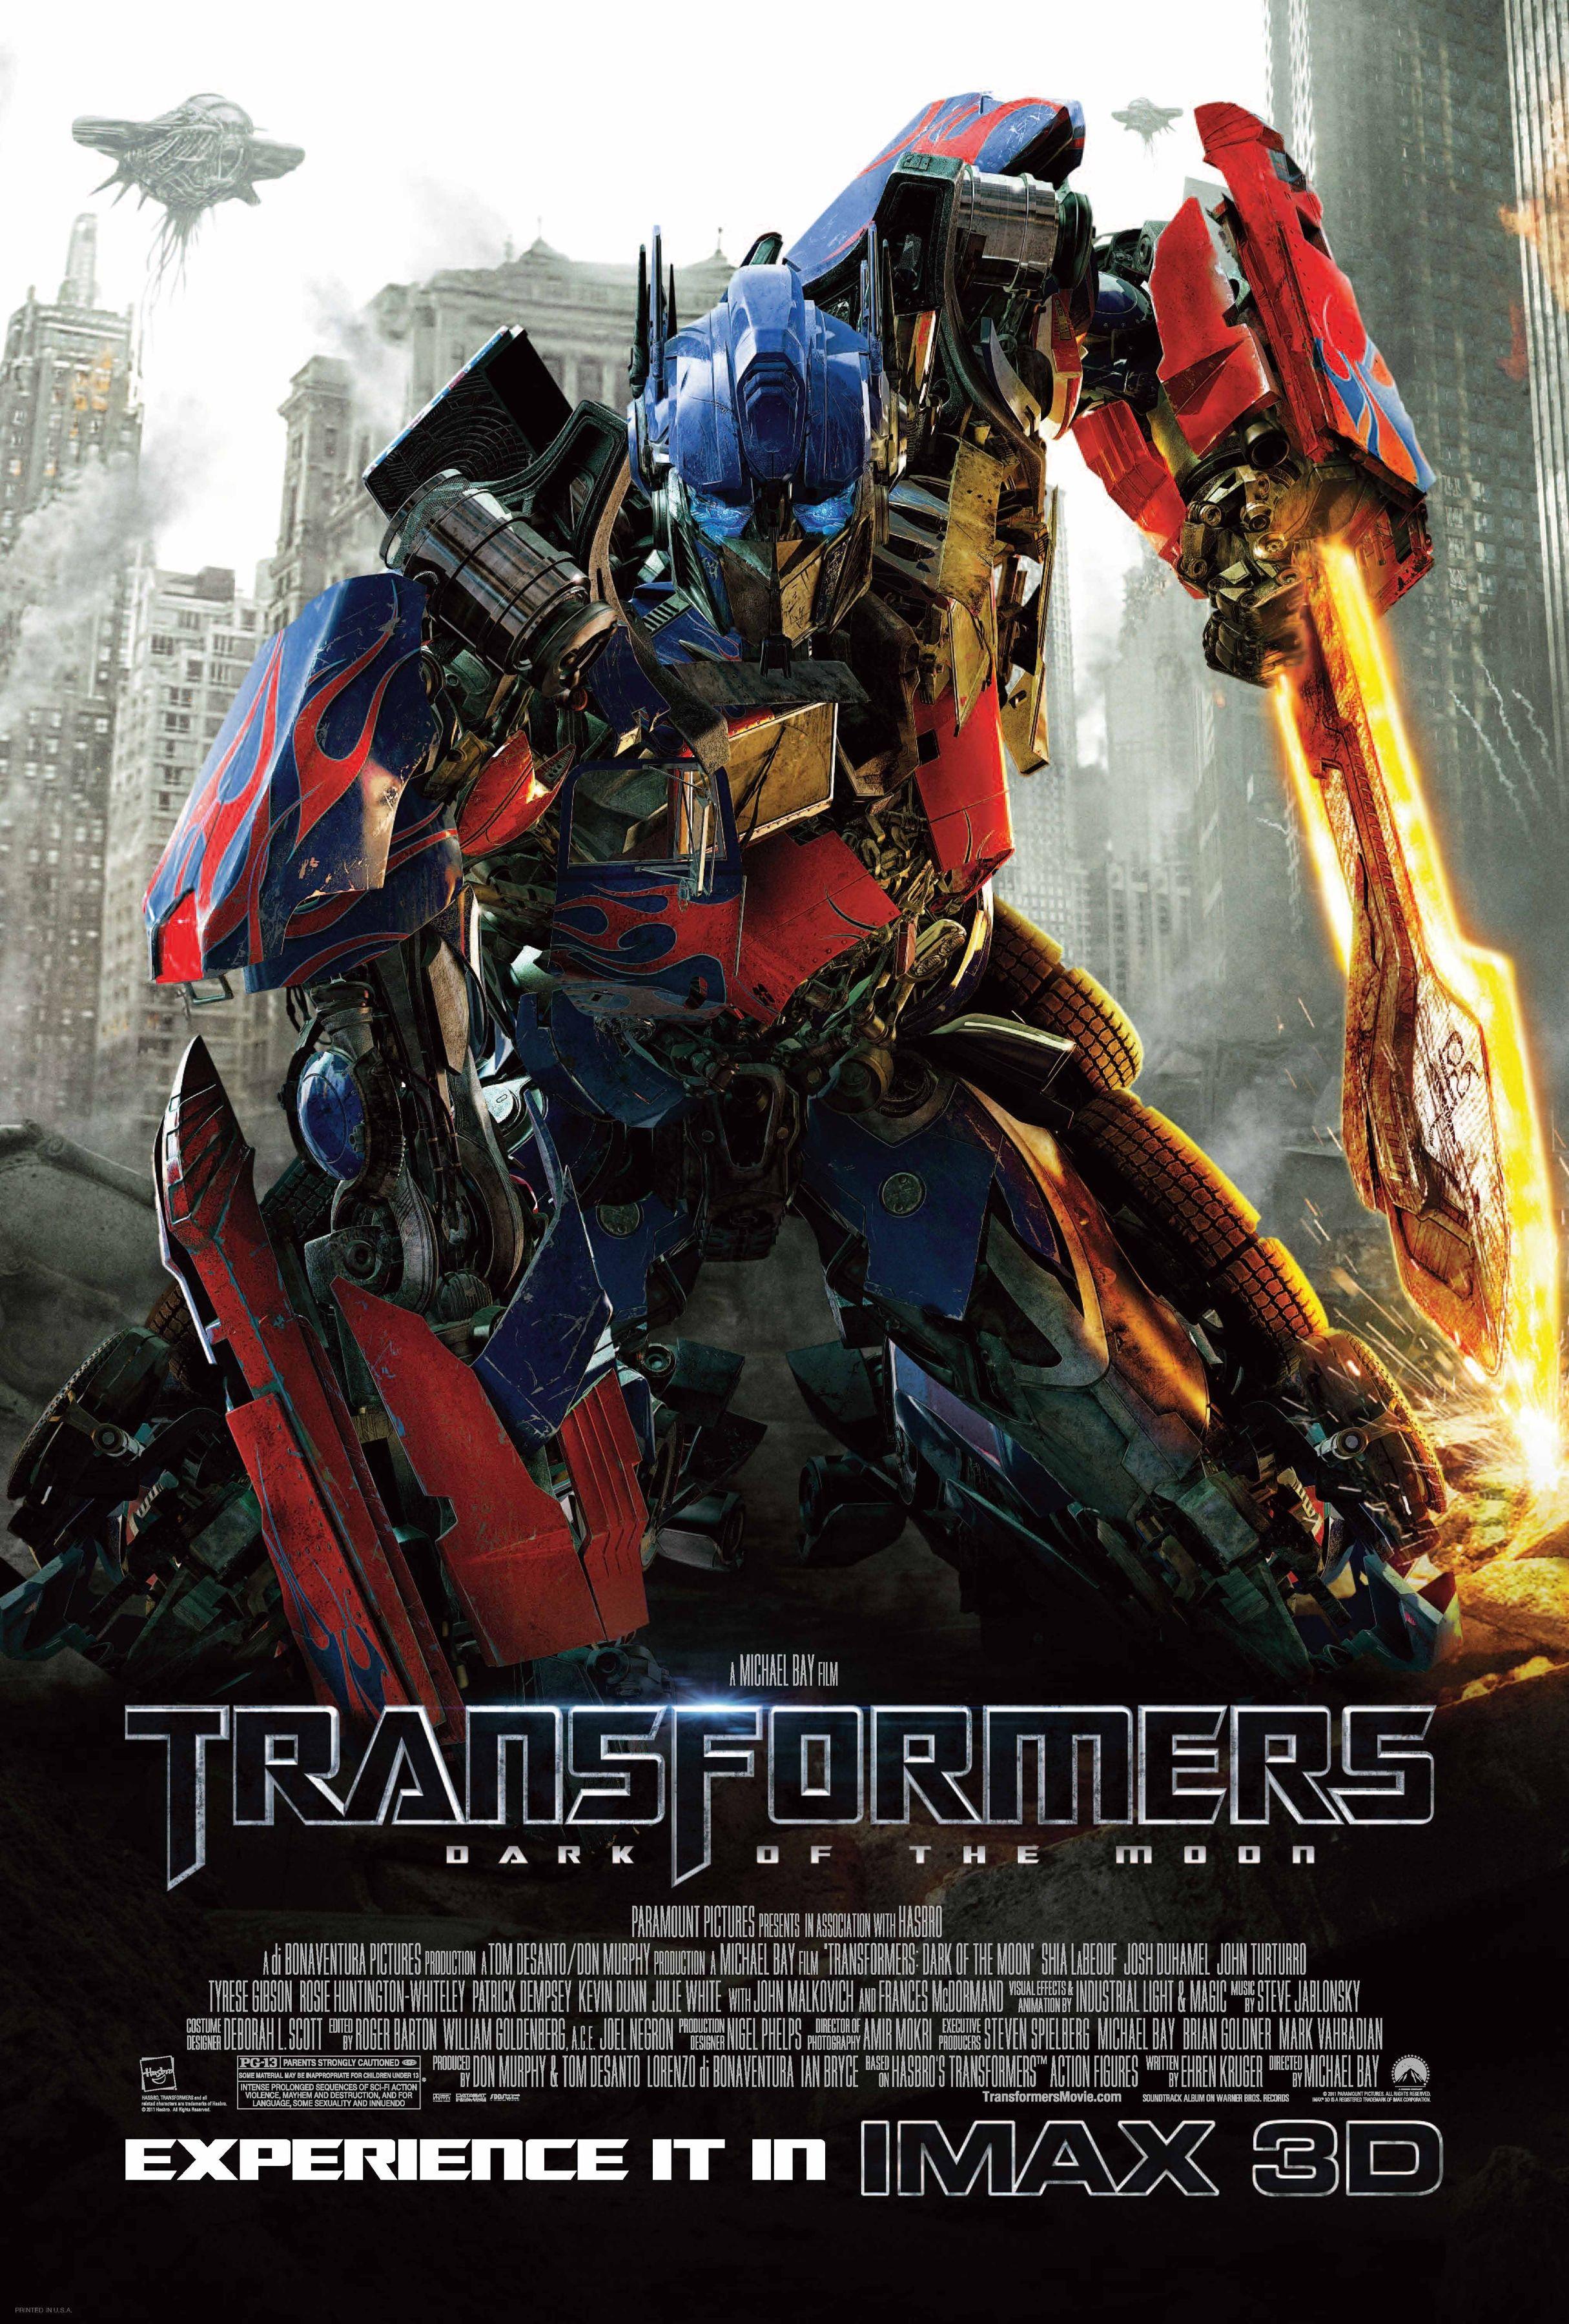 transformers dark of the moon | movies i like | pinterest | movie